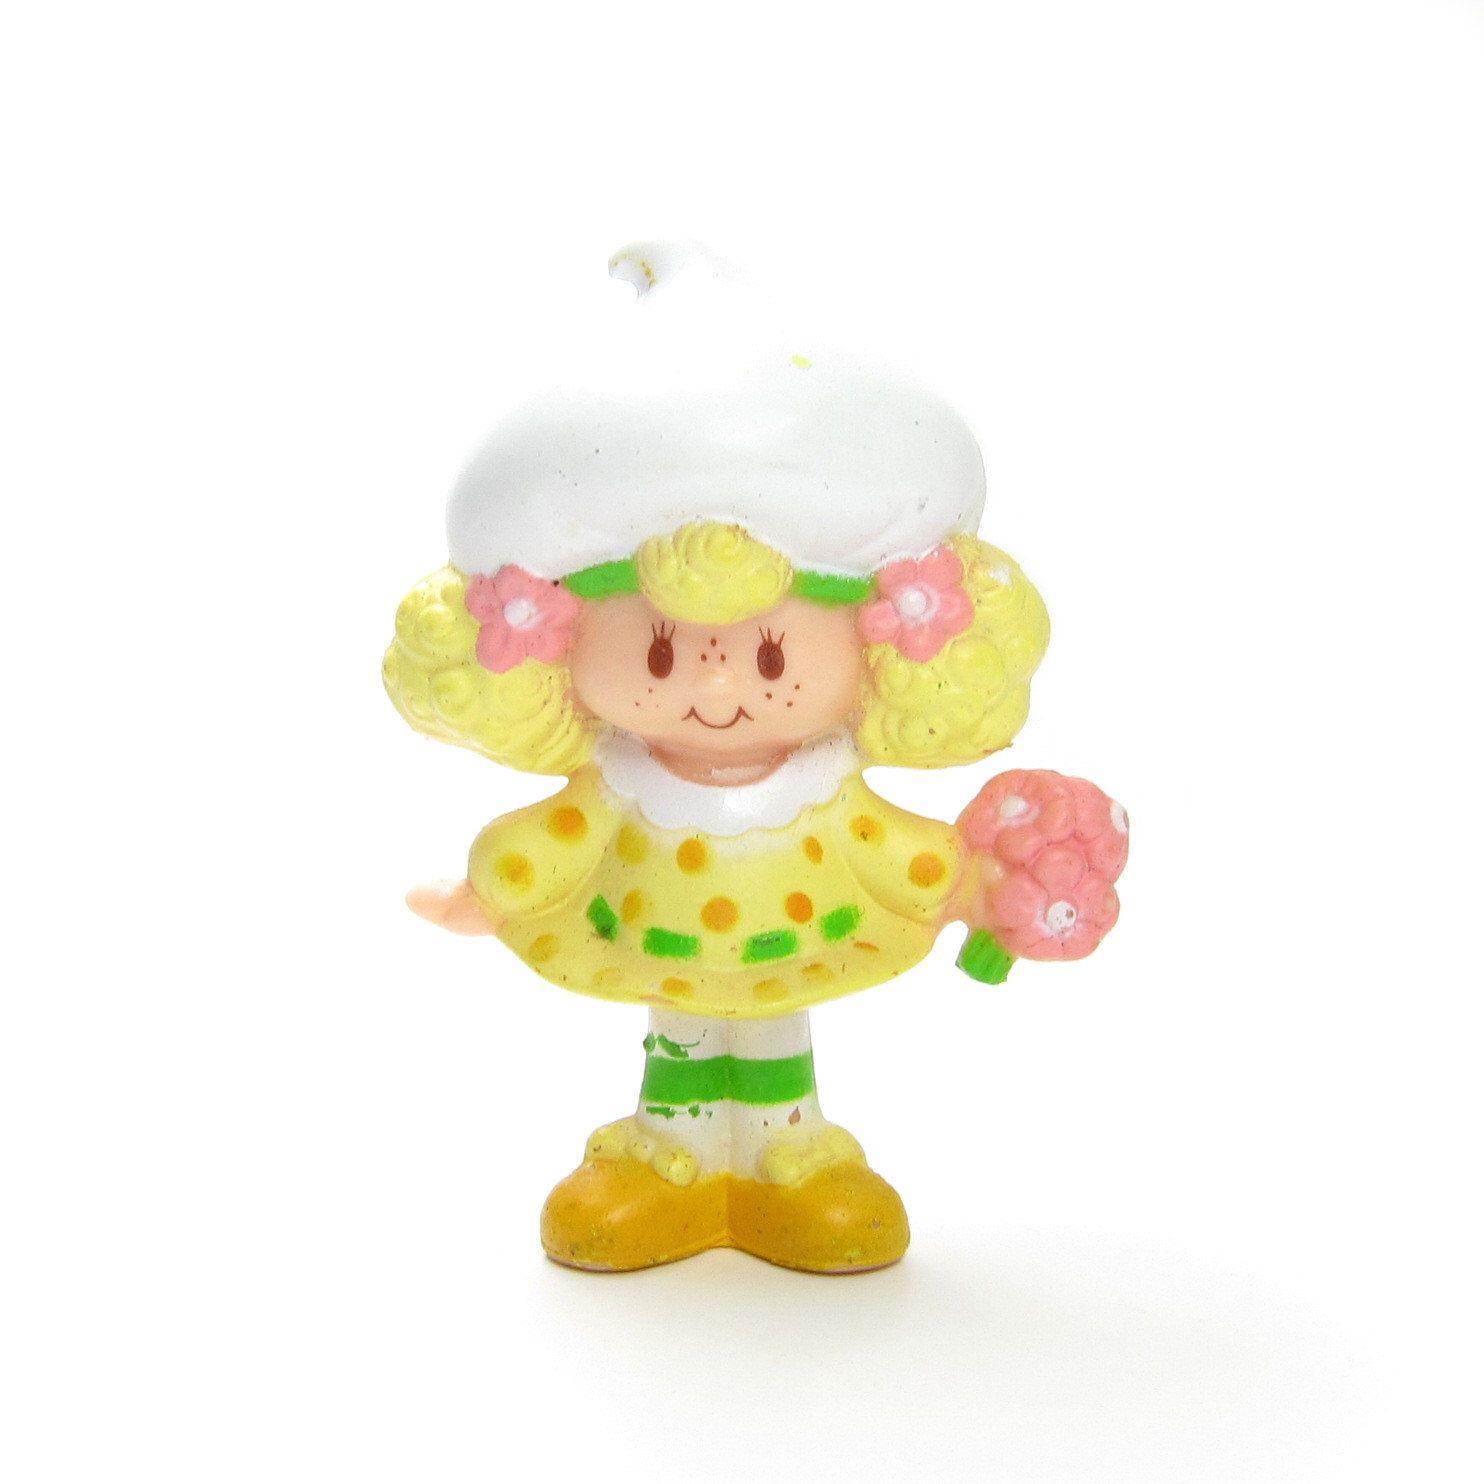 Lemon Meringue Holding Flowers Strawberry Shortcake PVC Figure Figurine